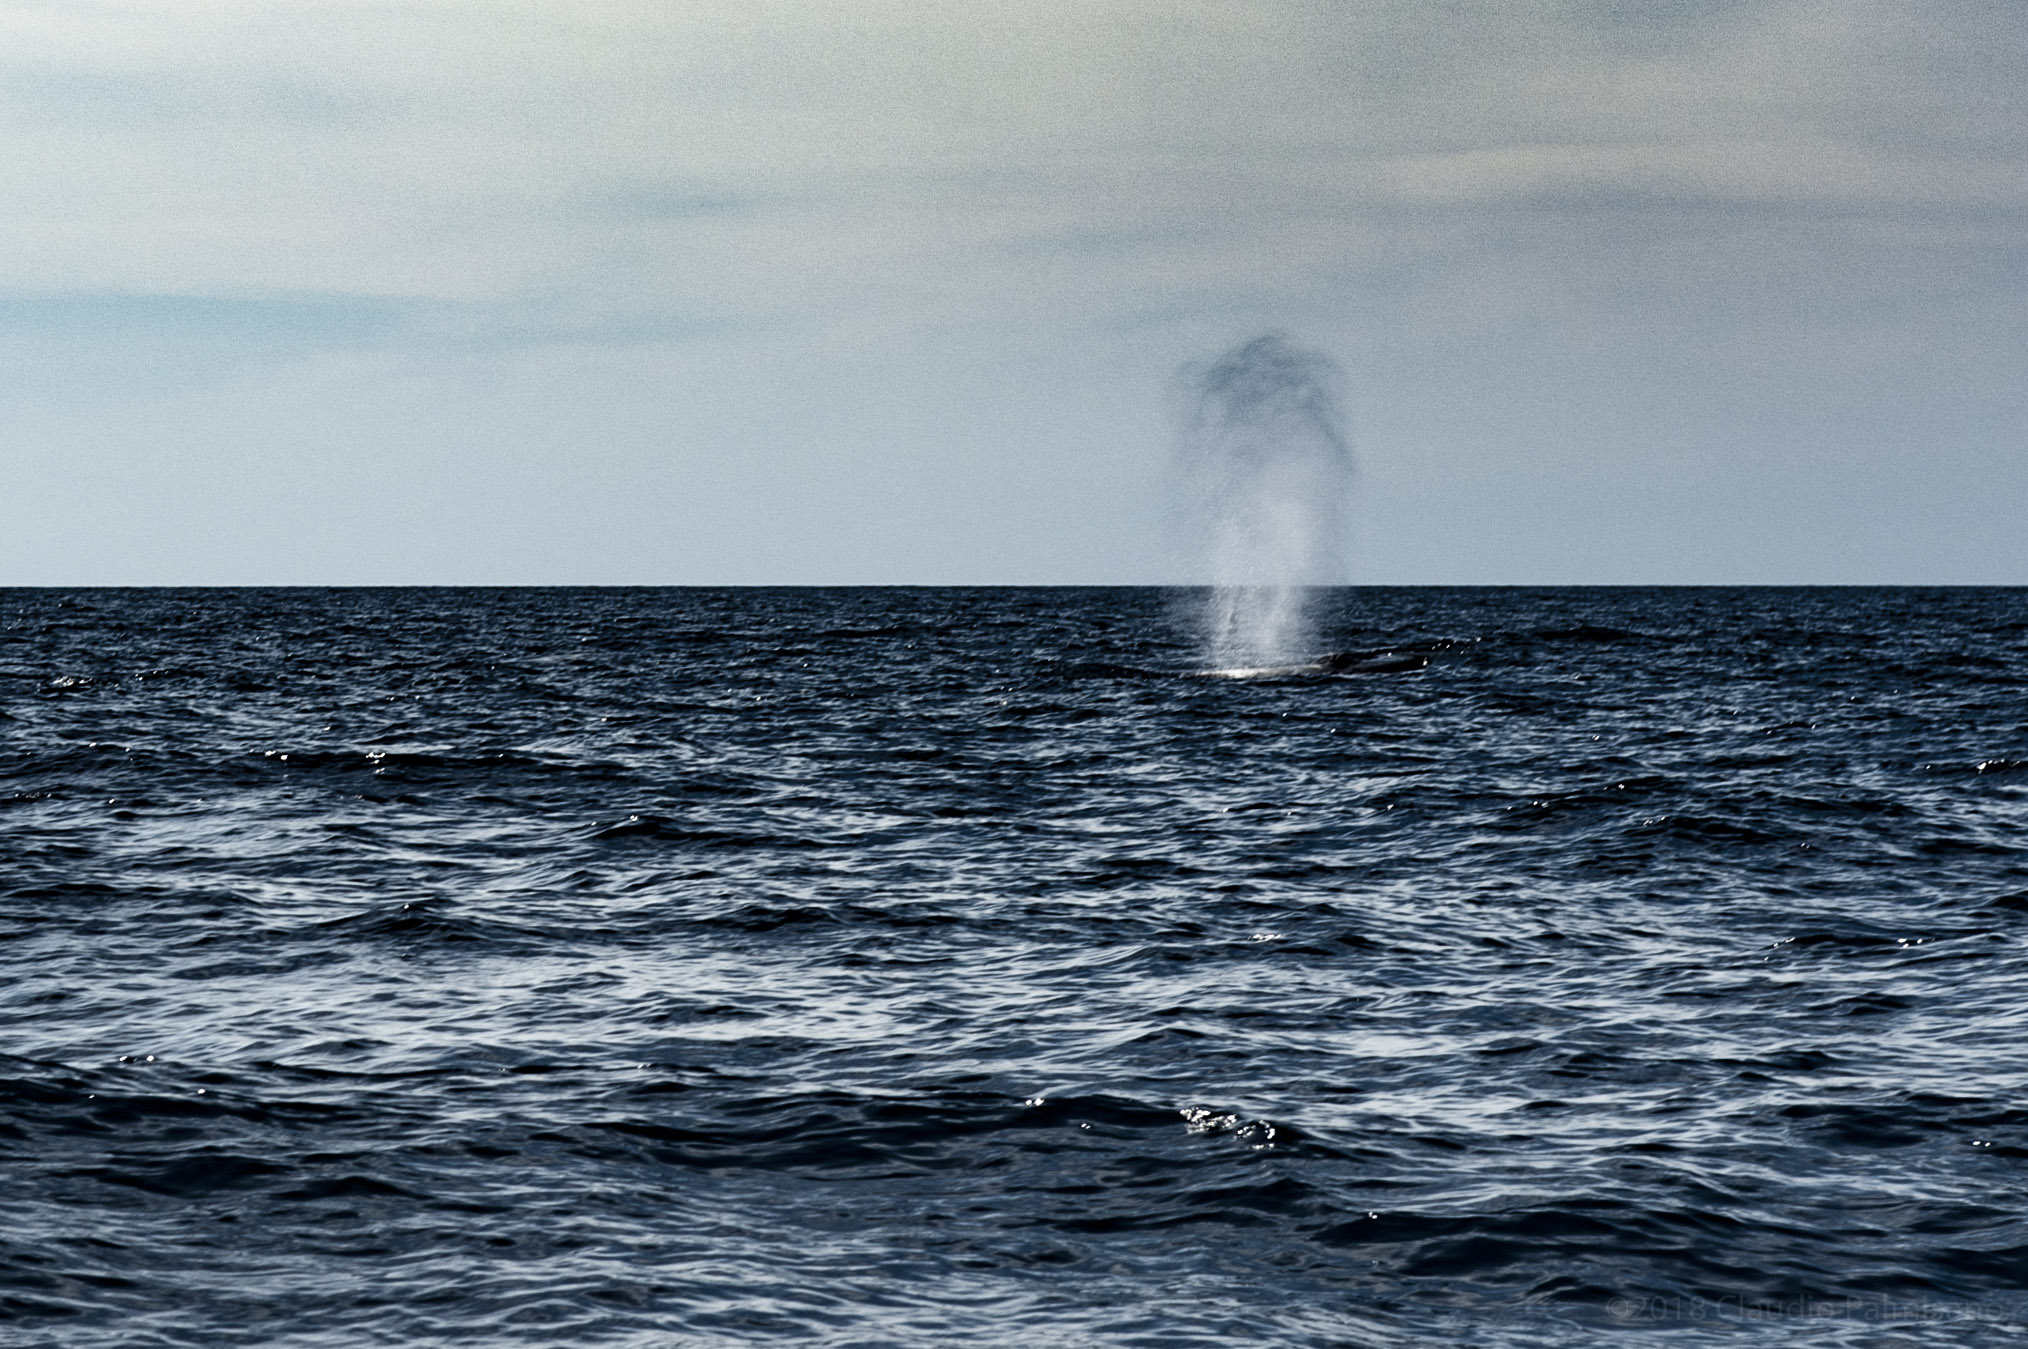 A Fin Whale Blow. (Lampedusa, 2018)